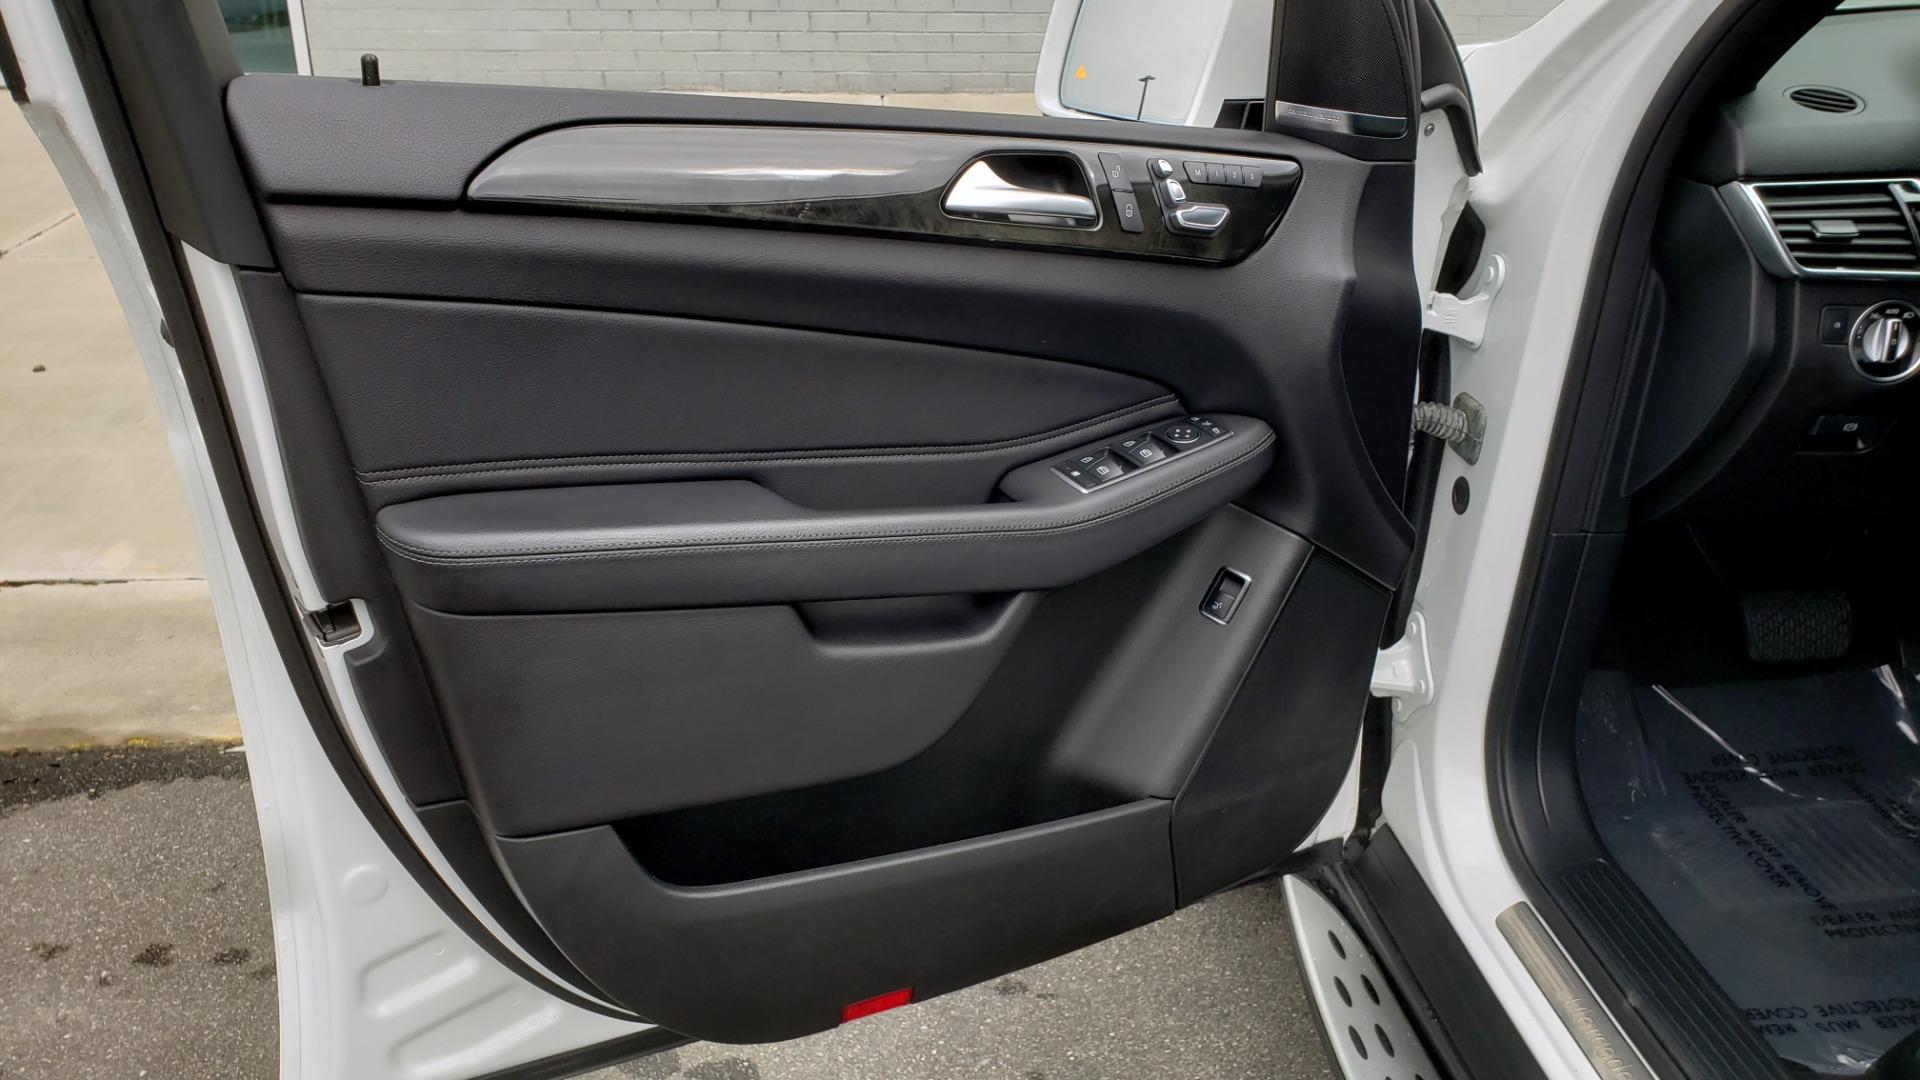 Used 2018 Mercedes-Benz GLE 350 4MATIC / PREM PKG / NAV / PARK ASST / K/H SND / HITCH / REARVIEW for sale $40,801 at Formula Imports in Charlotte NC 28227 35